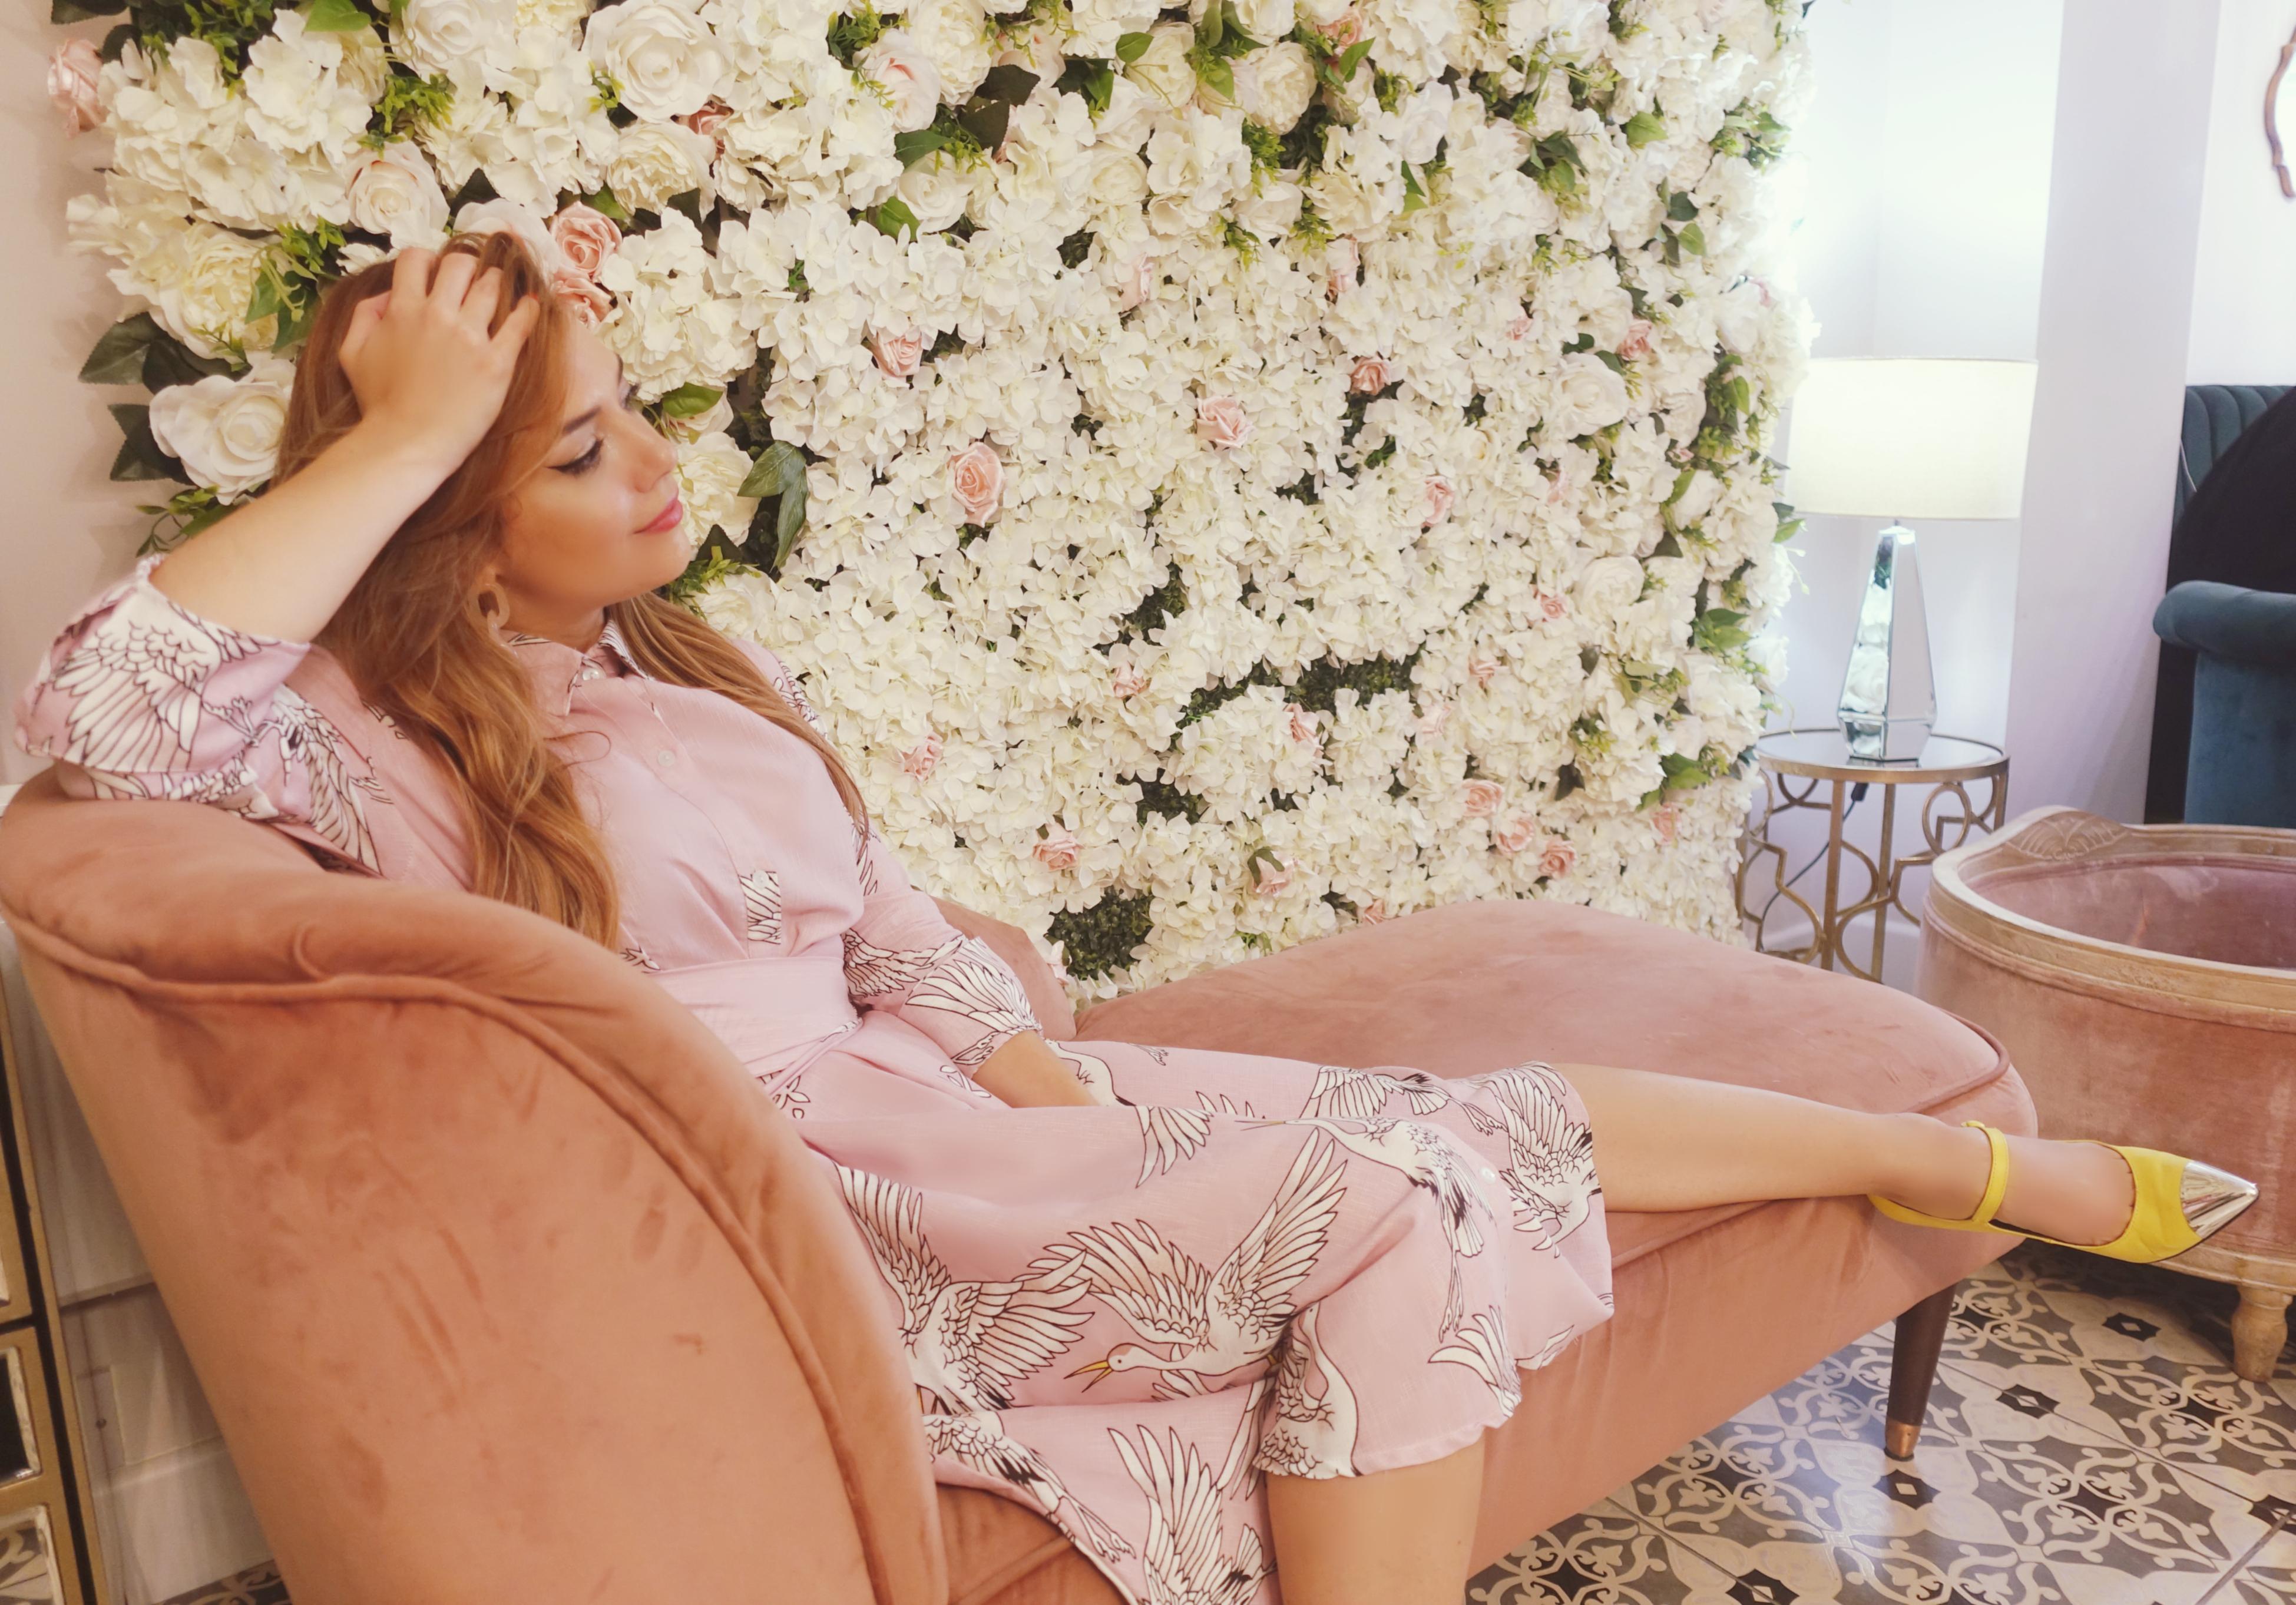 Asos-shoes-Smile-dress-blog-de-moda-ChicAdicta-influencer-PiensaenChic-vestidos-rosa-saintaymes-london-Chic-adicta-Piensa-en-Chic